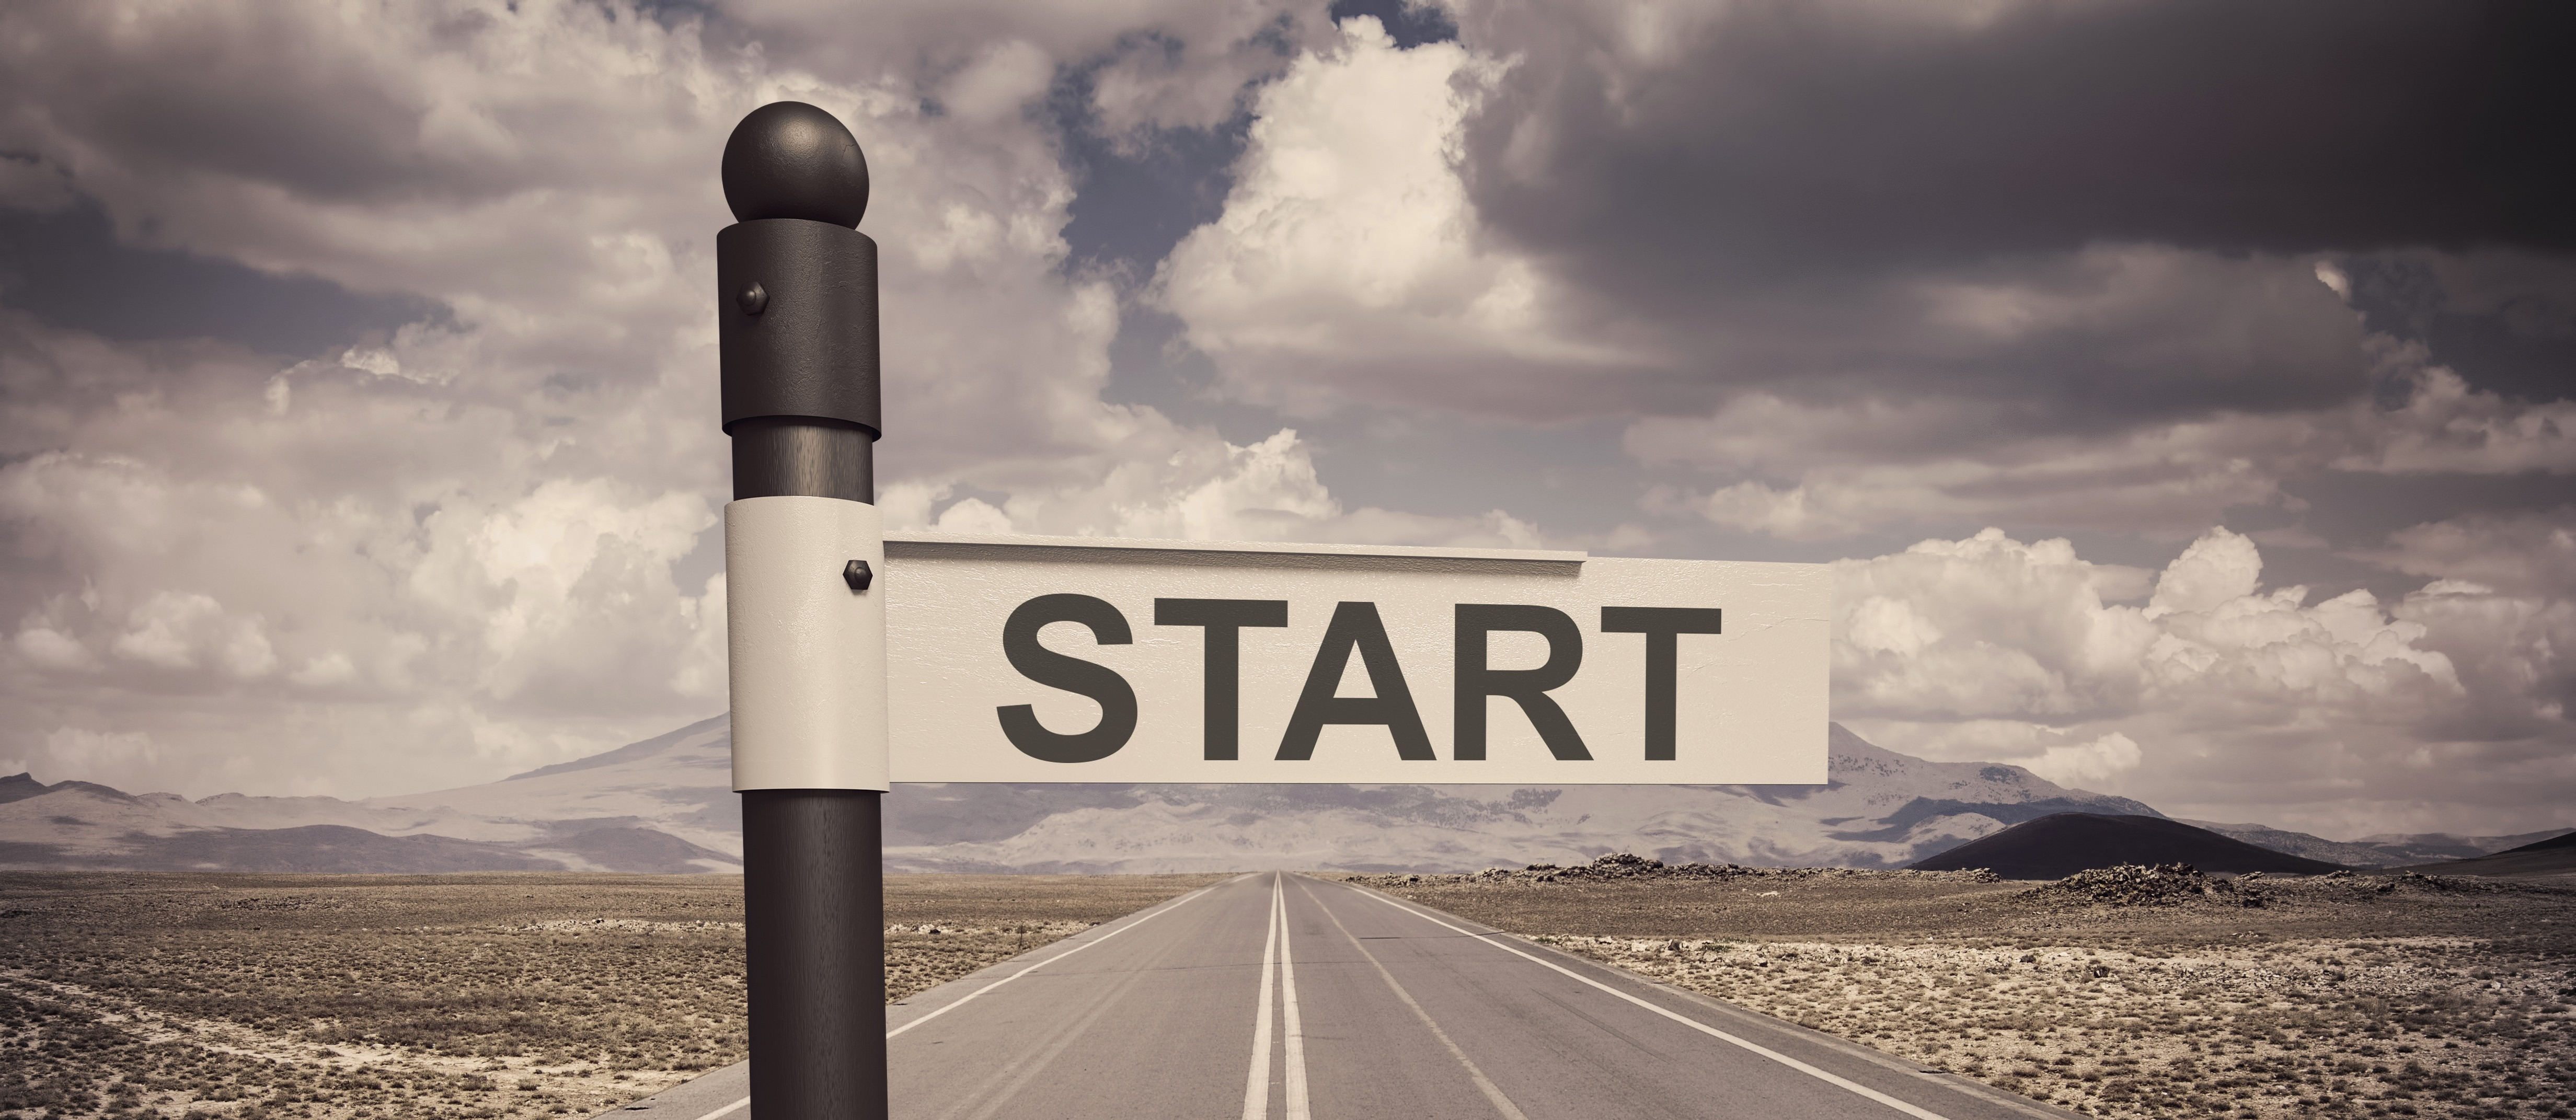 programa-de-afiliados-mentalidade-empreendedora